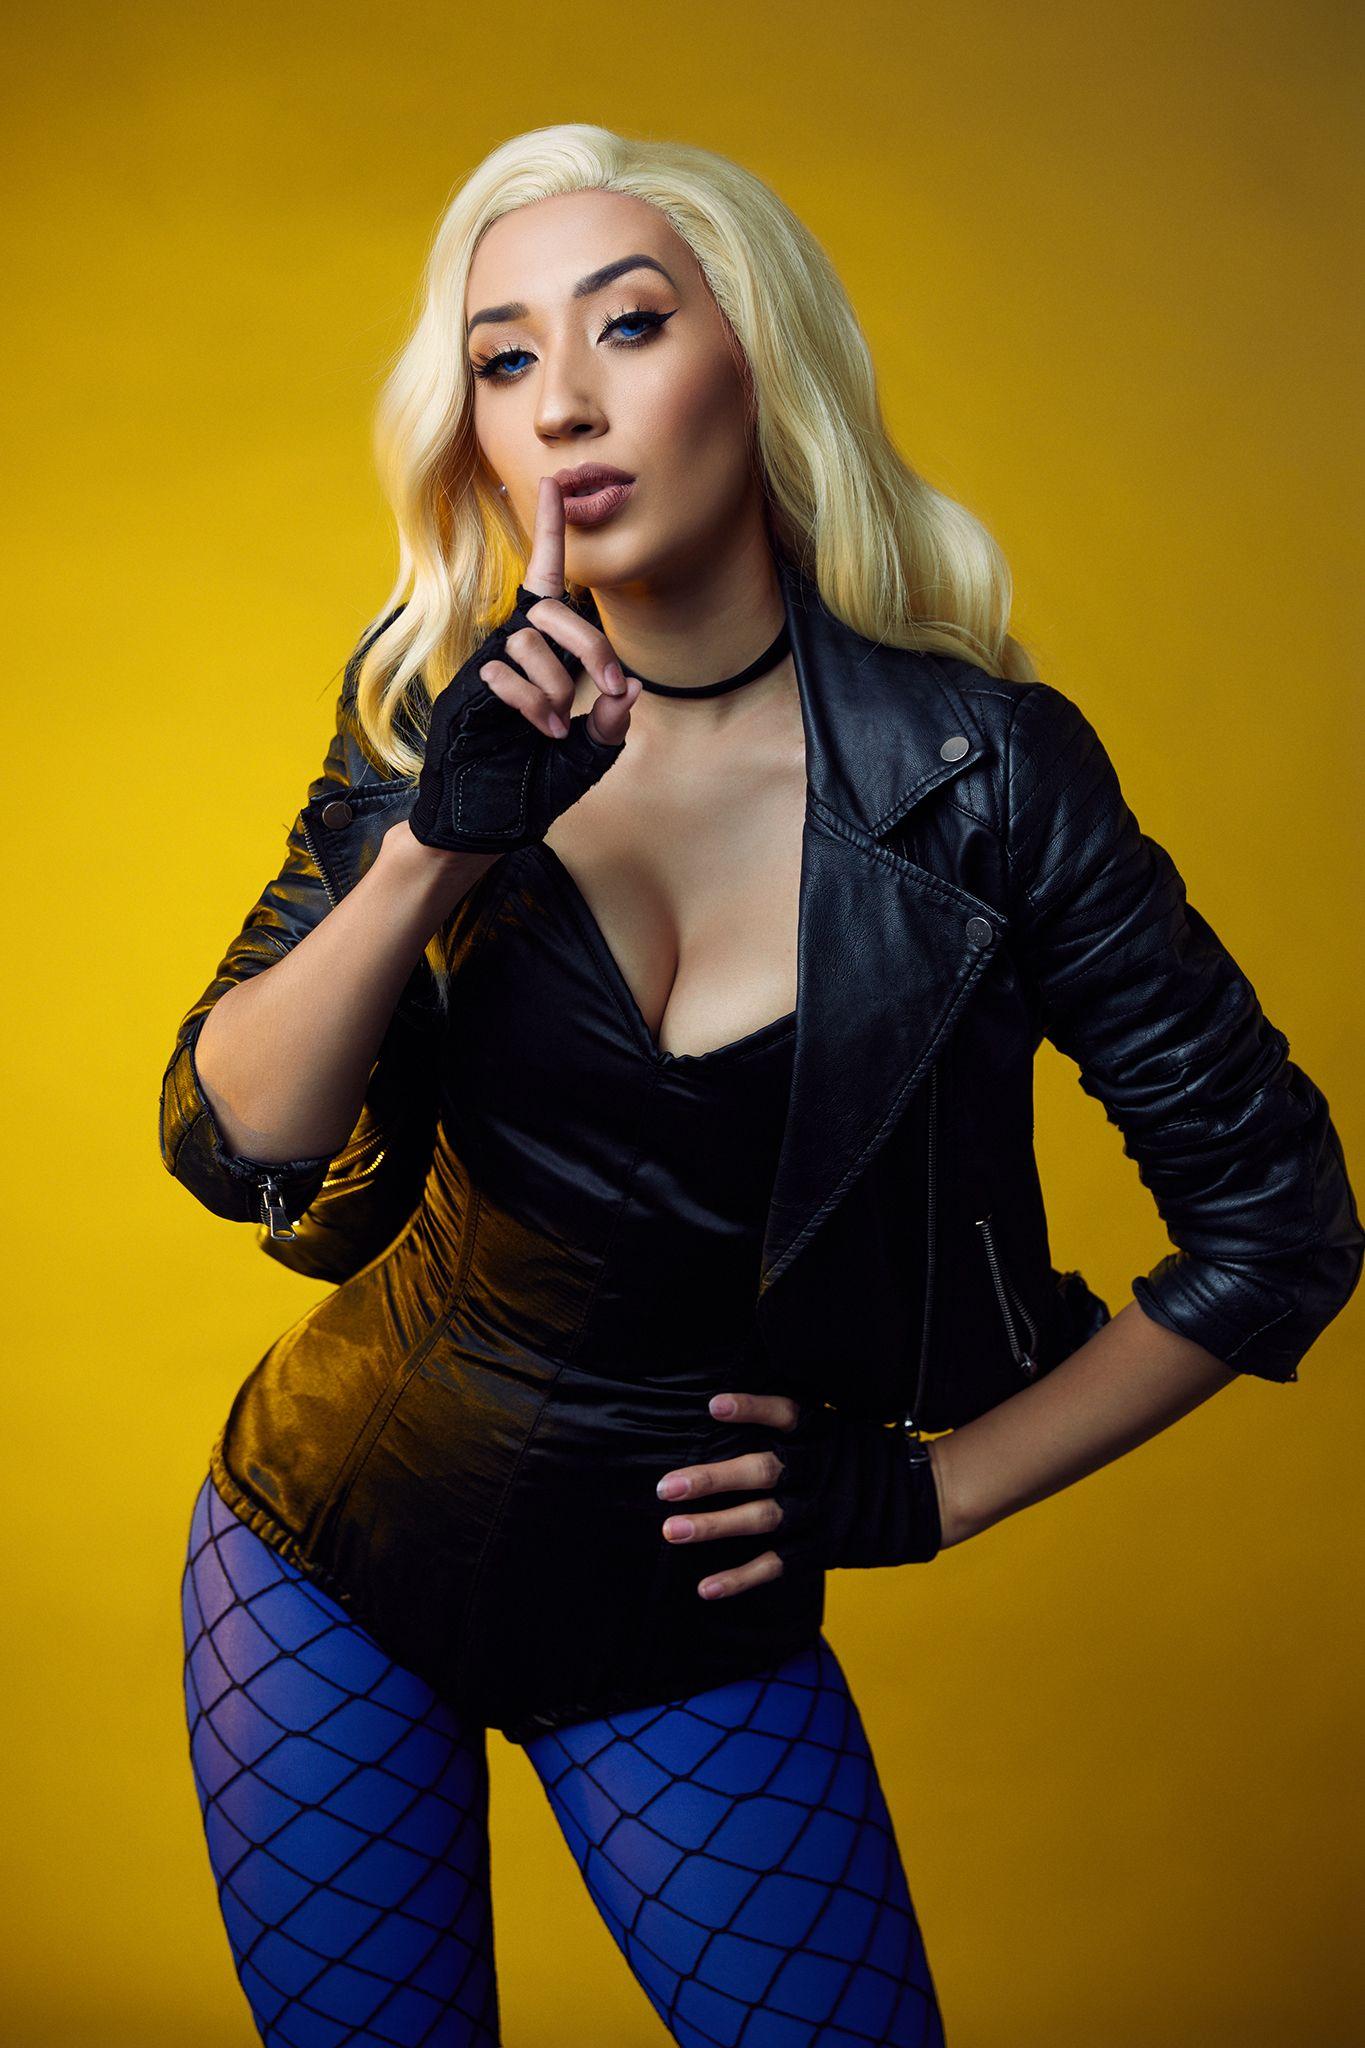 Black Canary | Black canary, Cosplay, Black